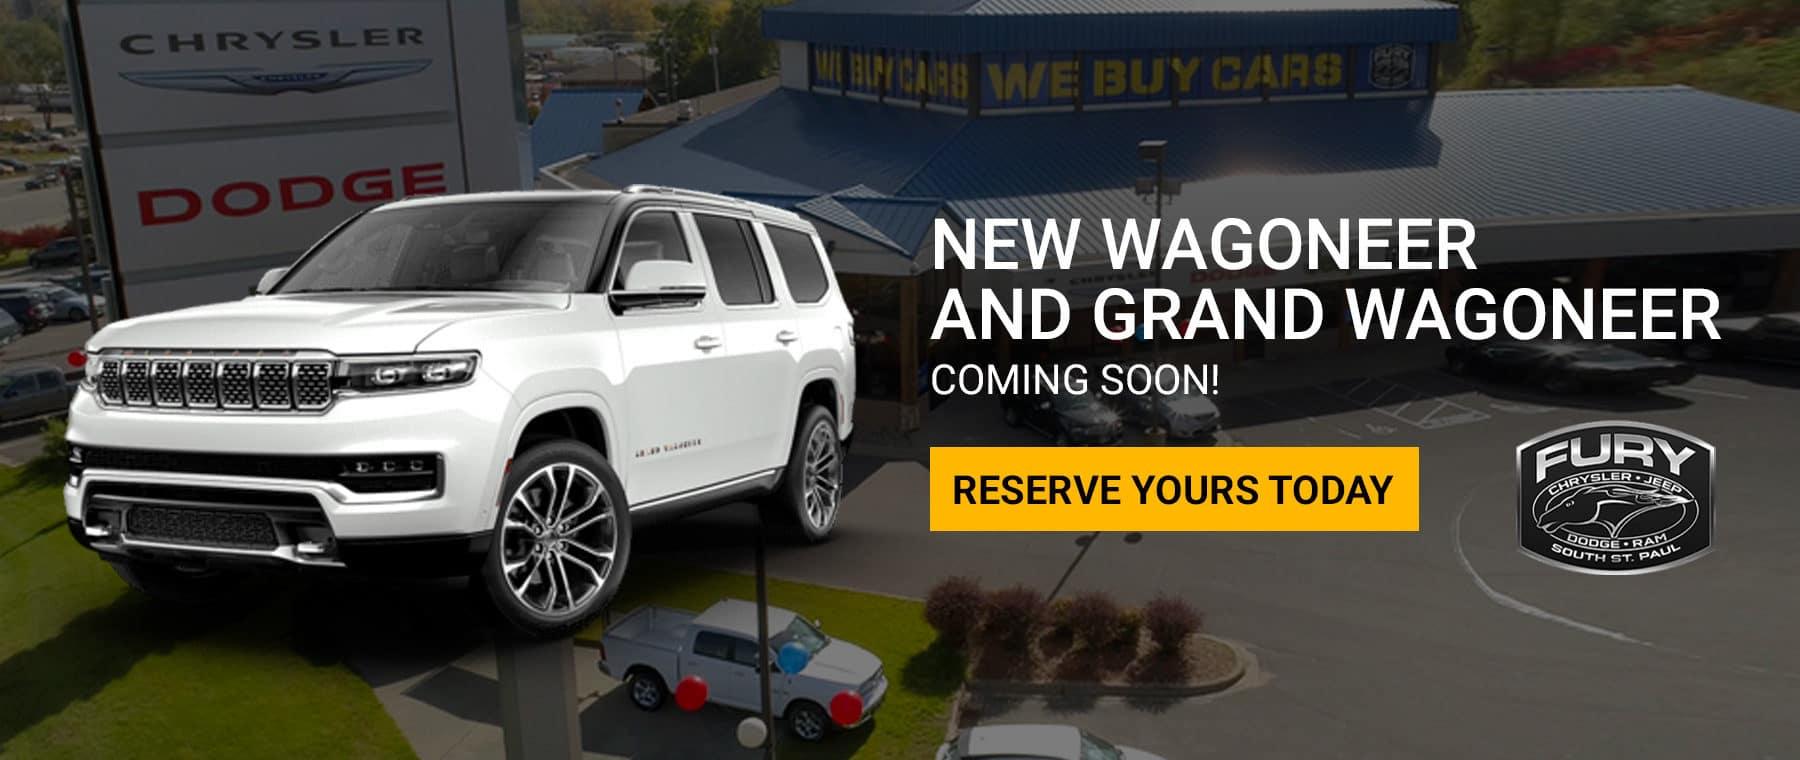 New Wagoneer and Grand Wagoneer, Coming Soon!